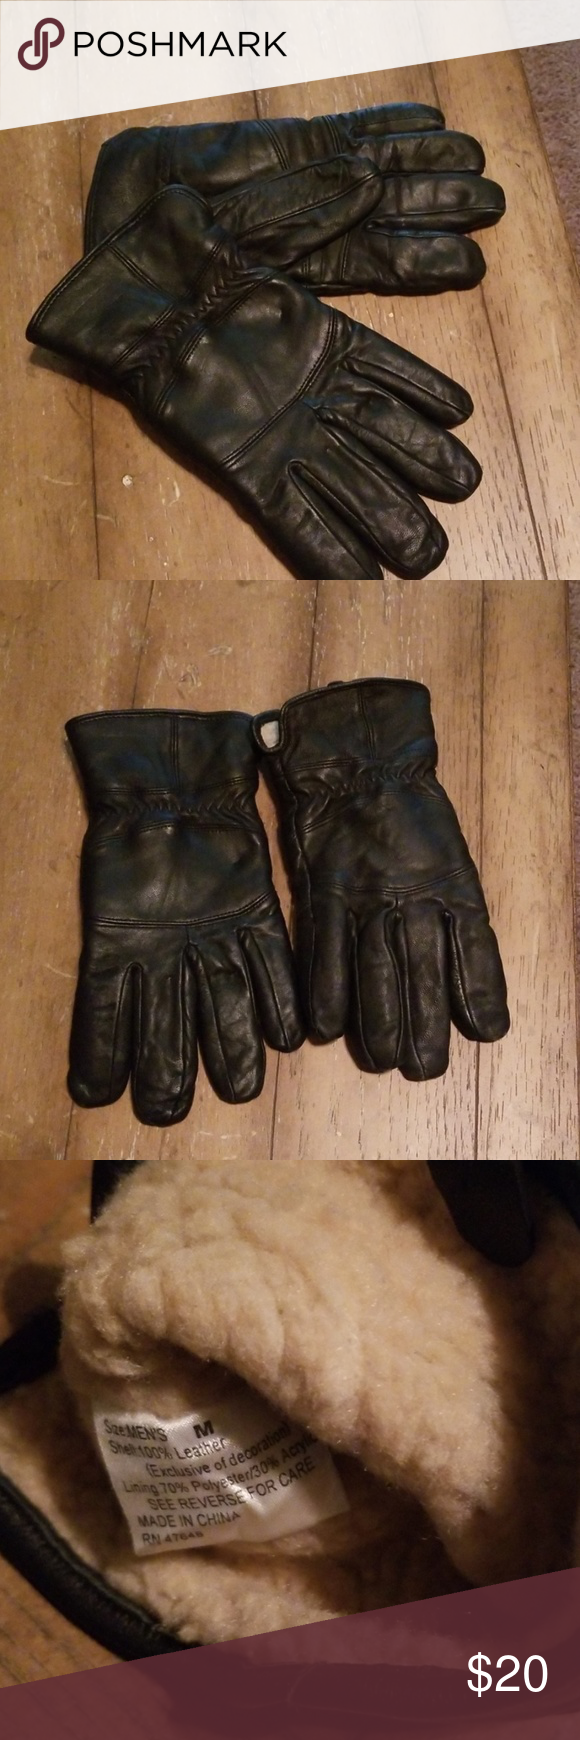 No Fingerprint Gloves Provencalvoice